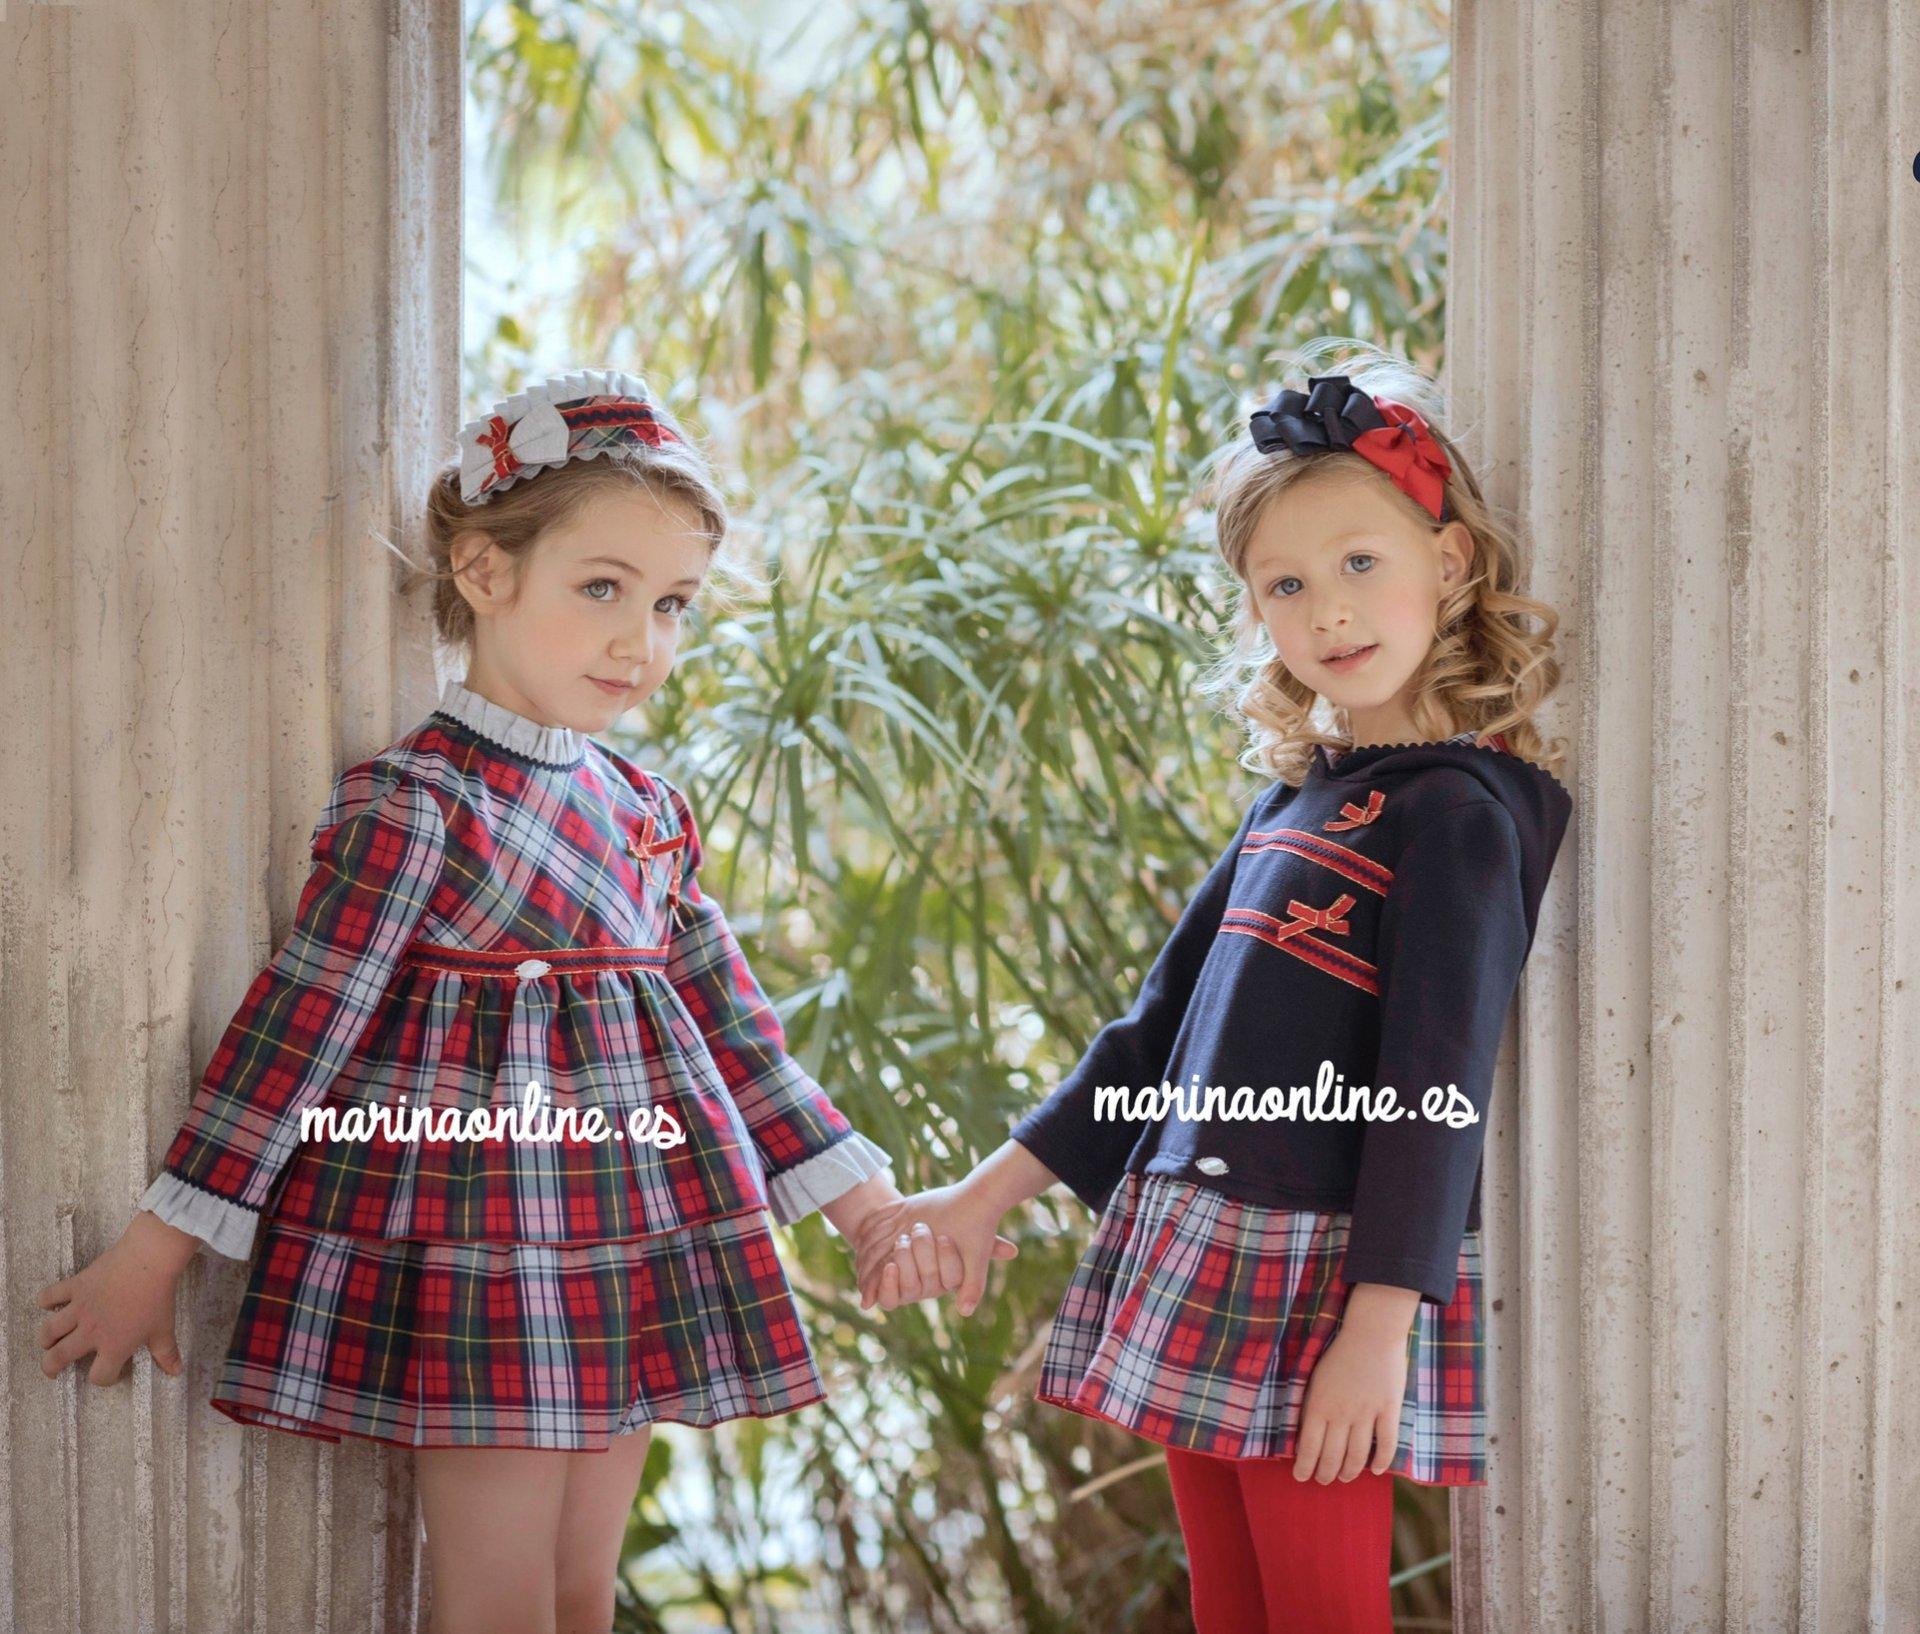 MirandaTextil Moda infantil marinaonline.es